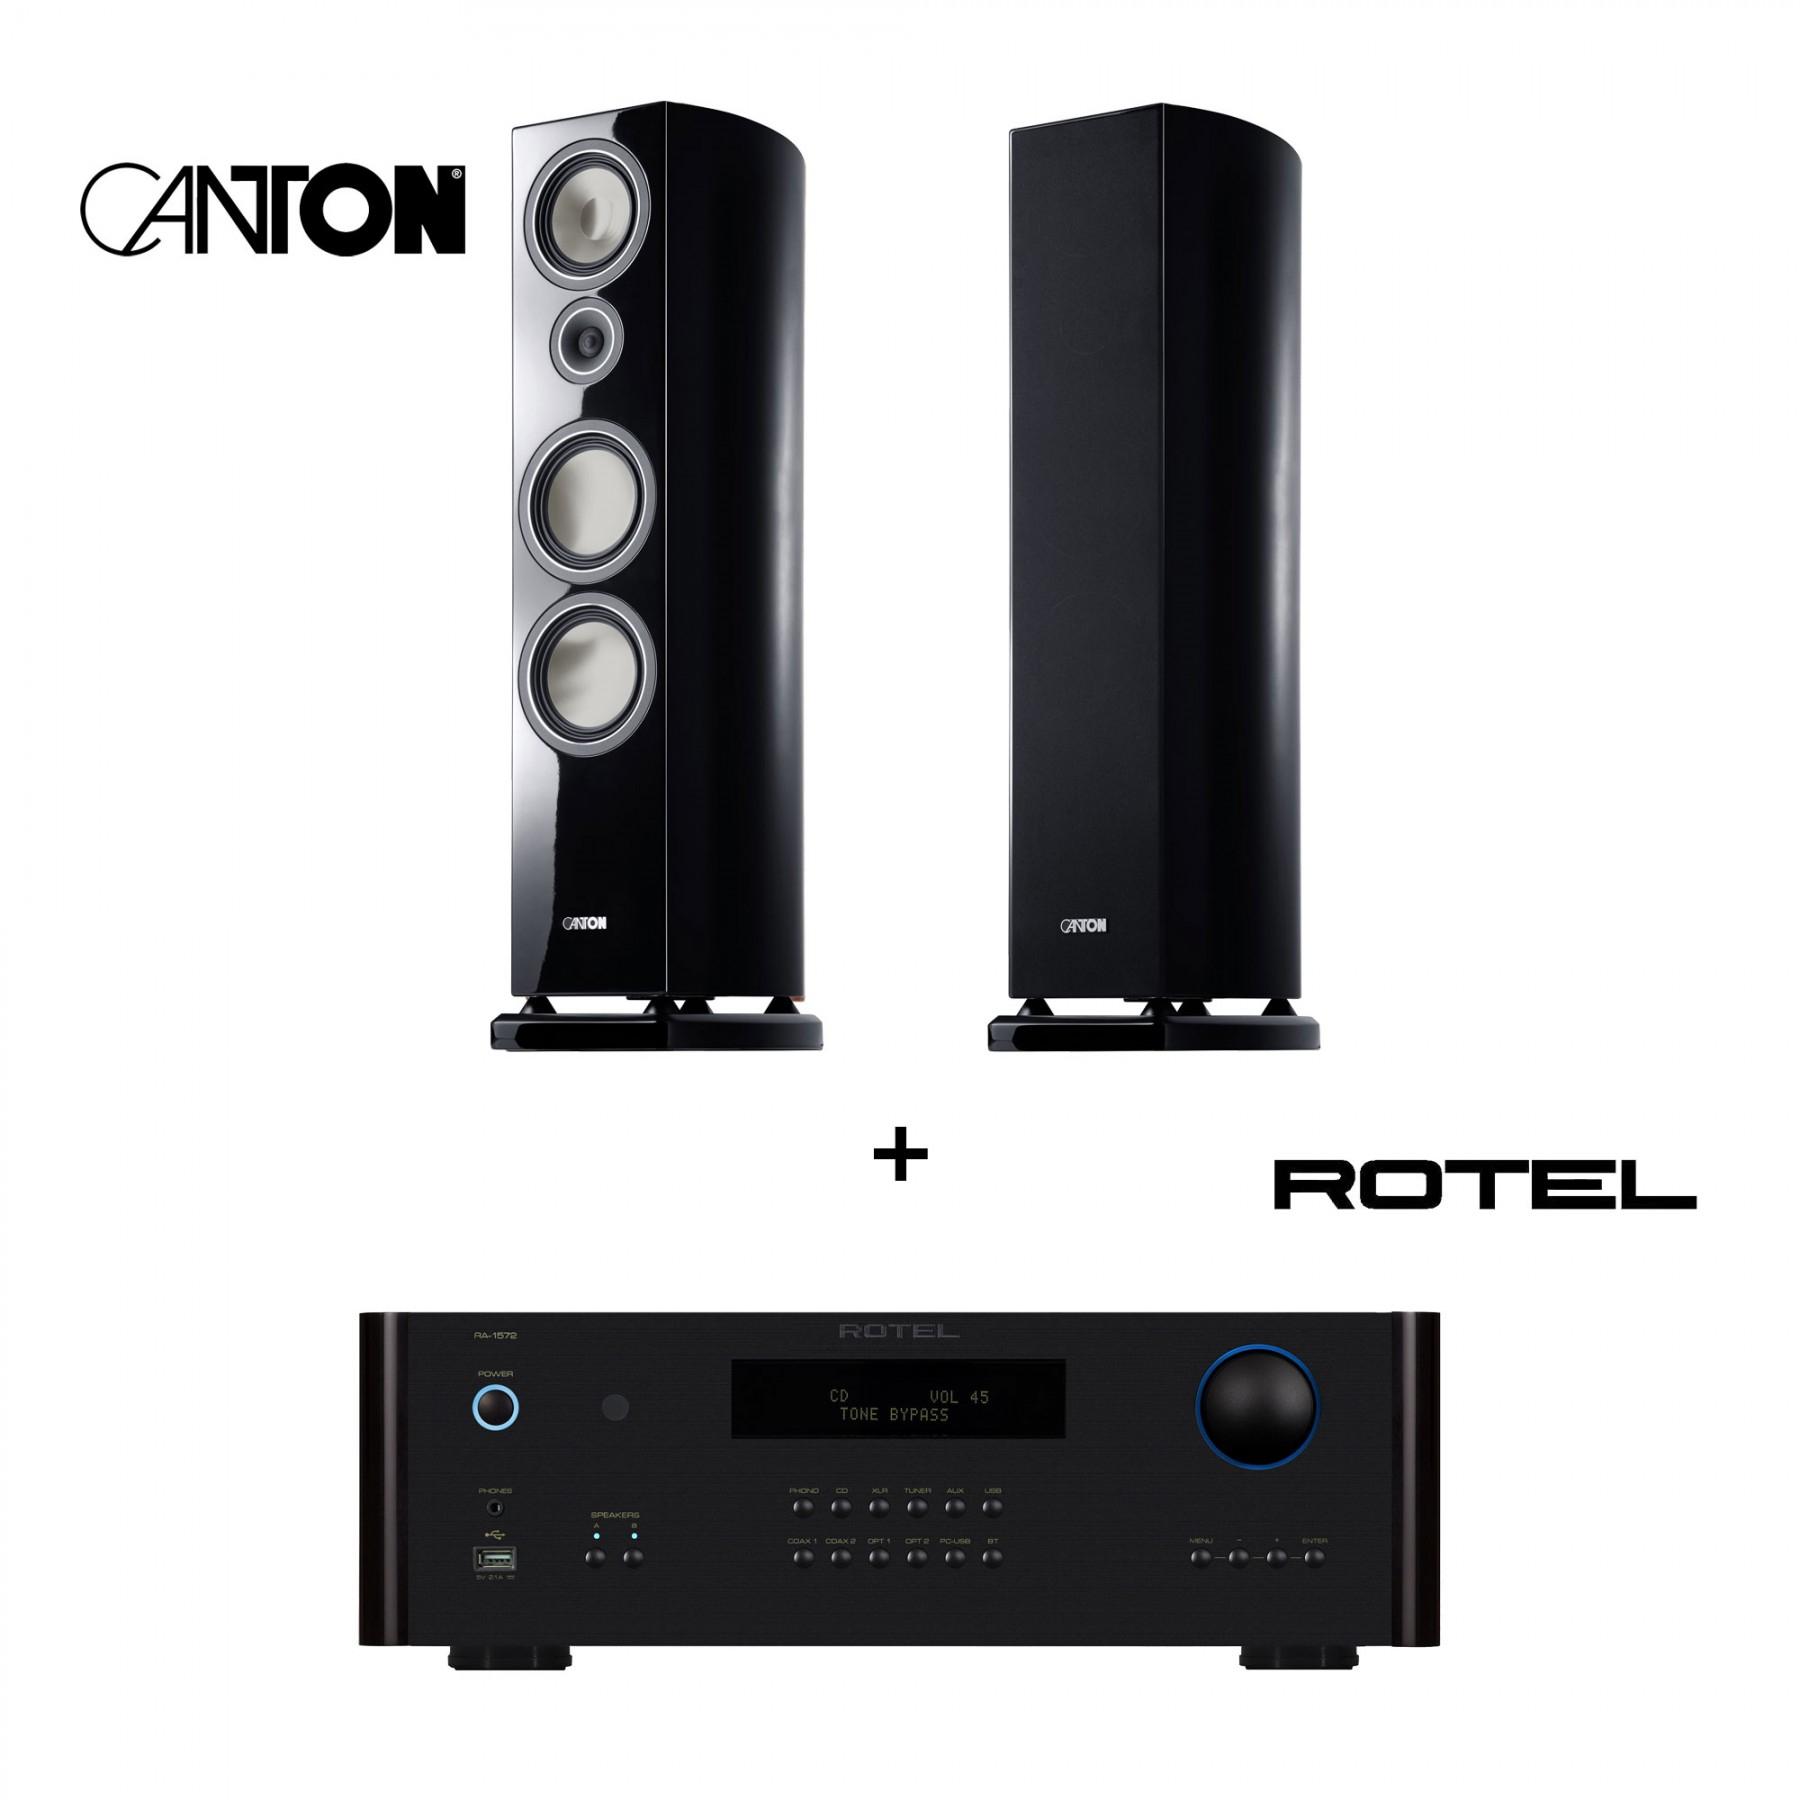 Stereo-Paket: Vollverstärker Rotel RA-1572 + ein Paar Standlautsprecher Canton Vento 896.2 DC